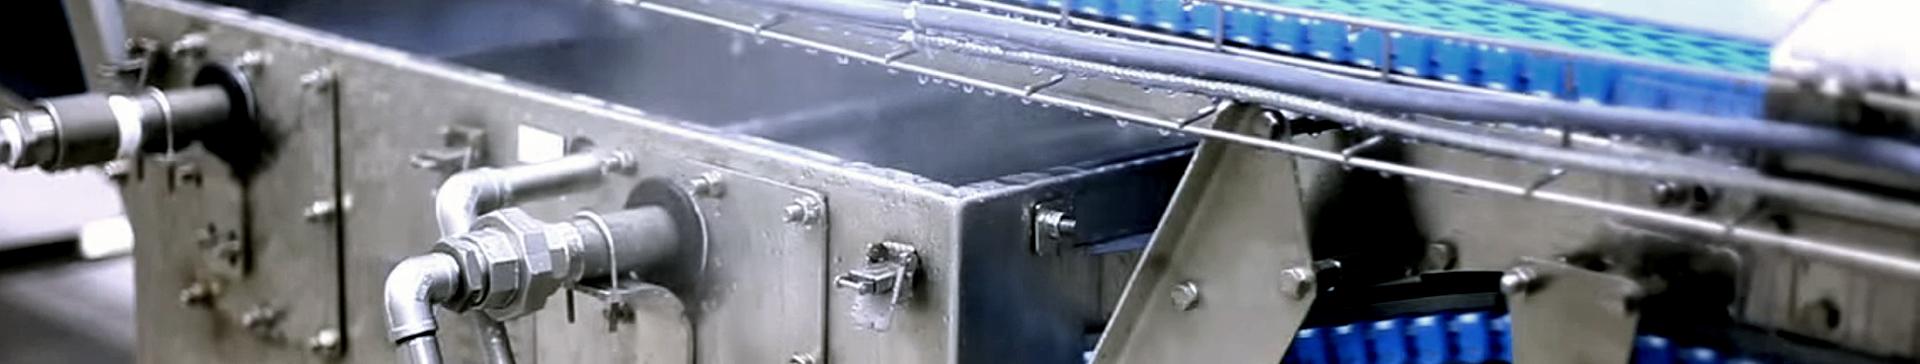 industrial waterproof connectors